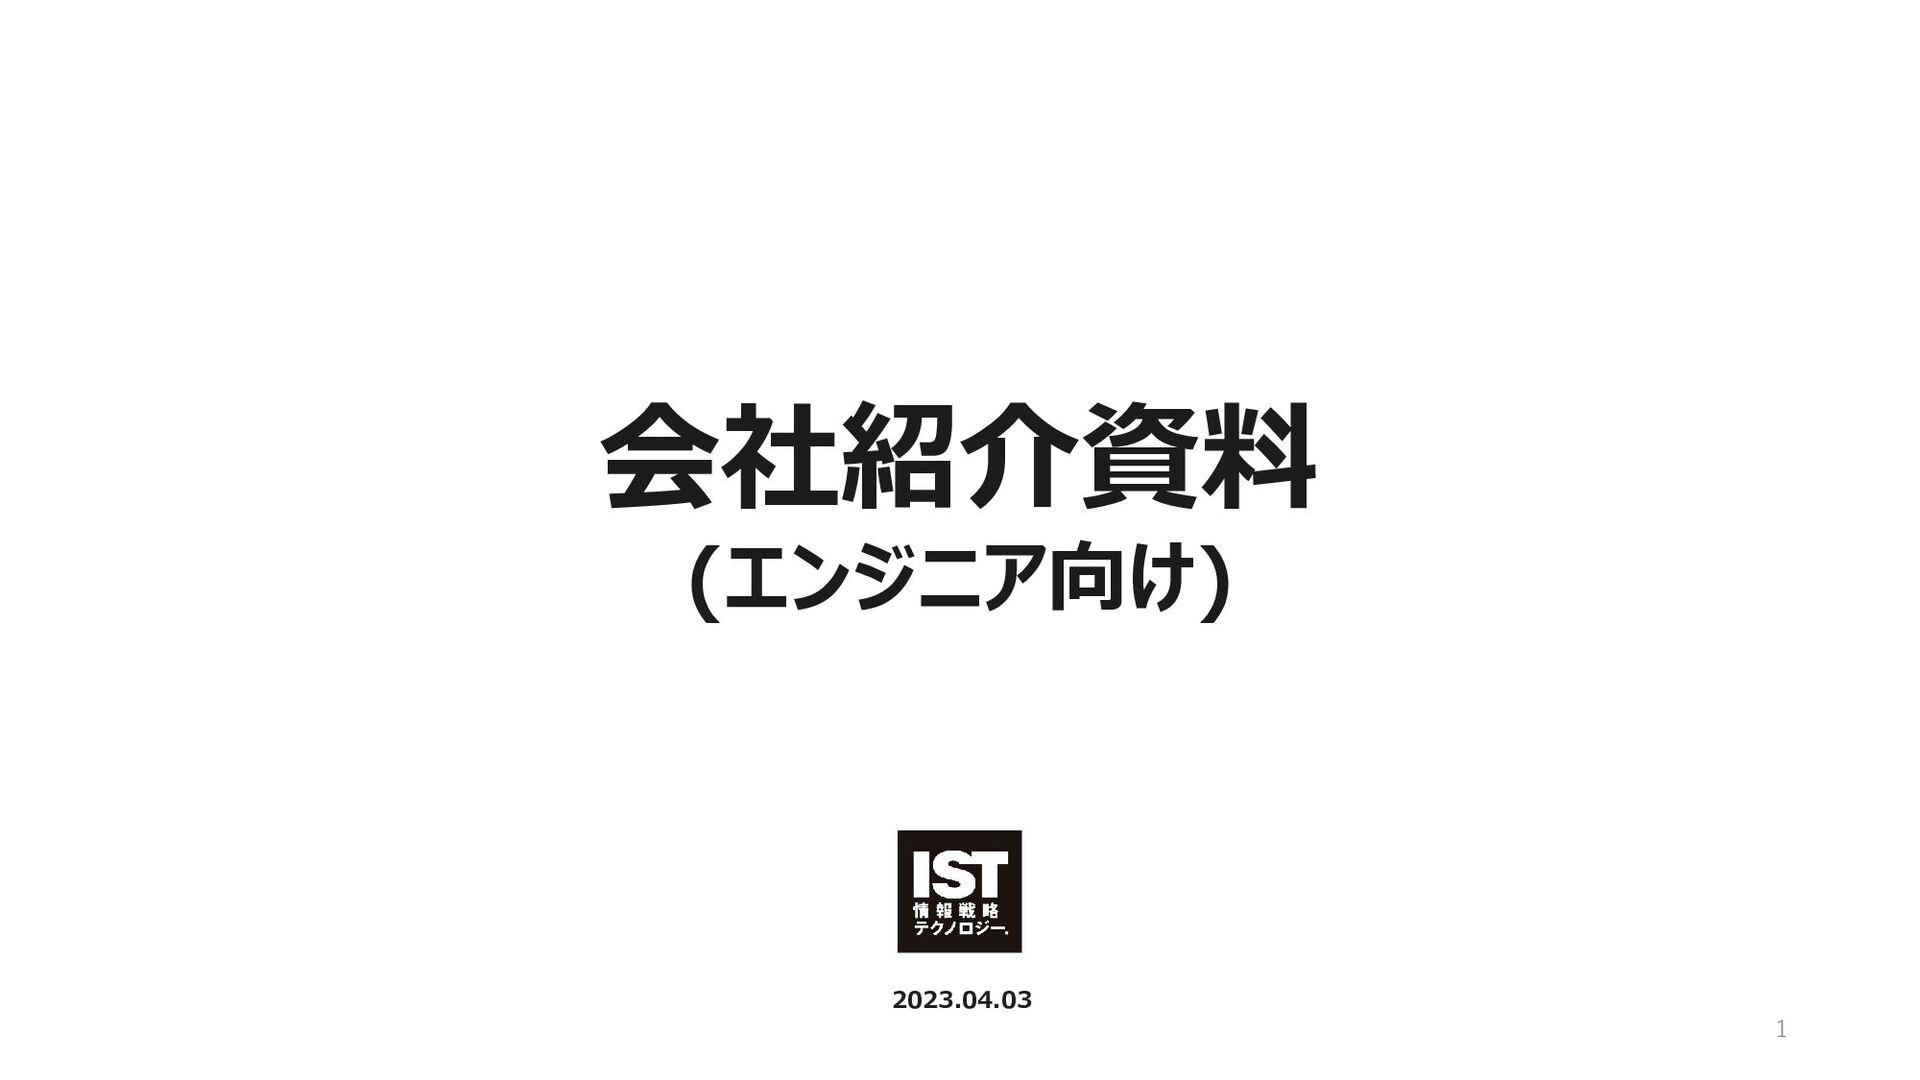 PHILOSOPHY GUIDE 2021年4月1日 改訂